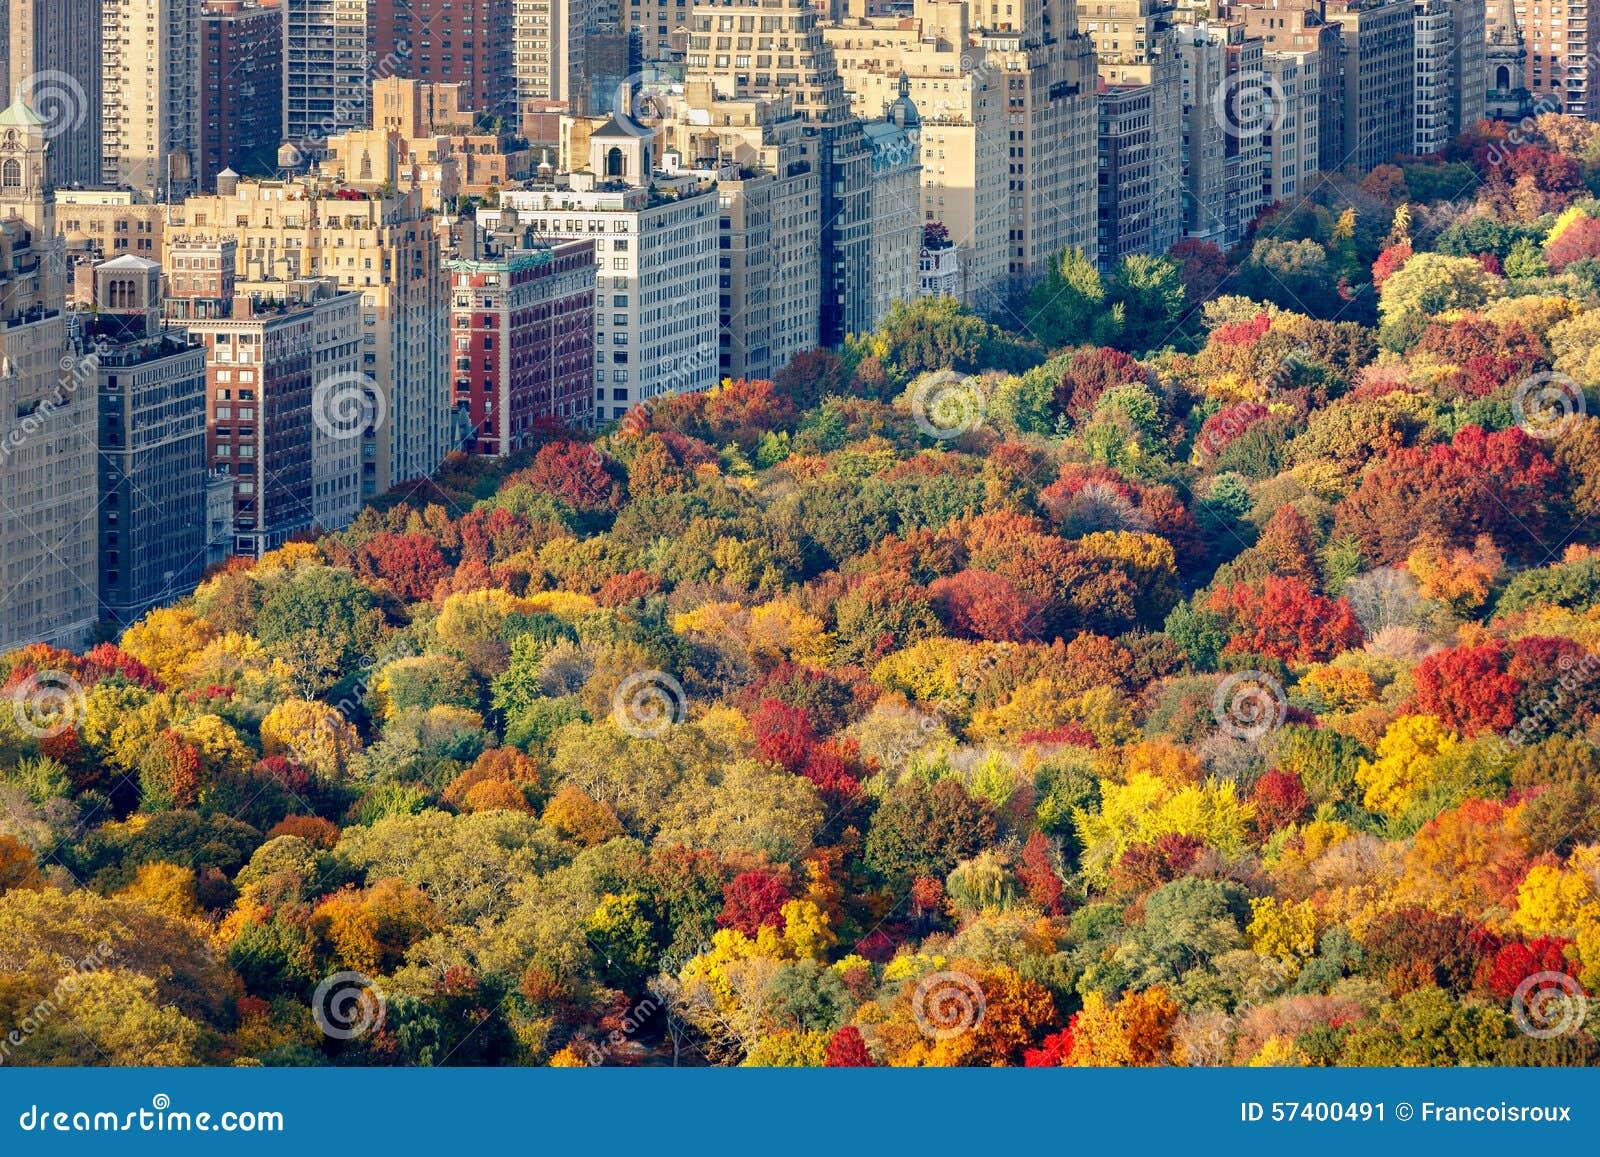 ... toward Central Park West. Upper West Side, Manhattan, New York City